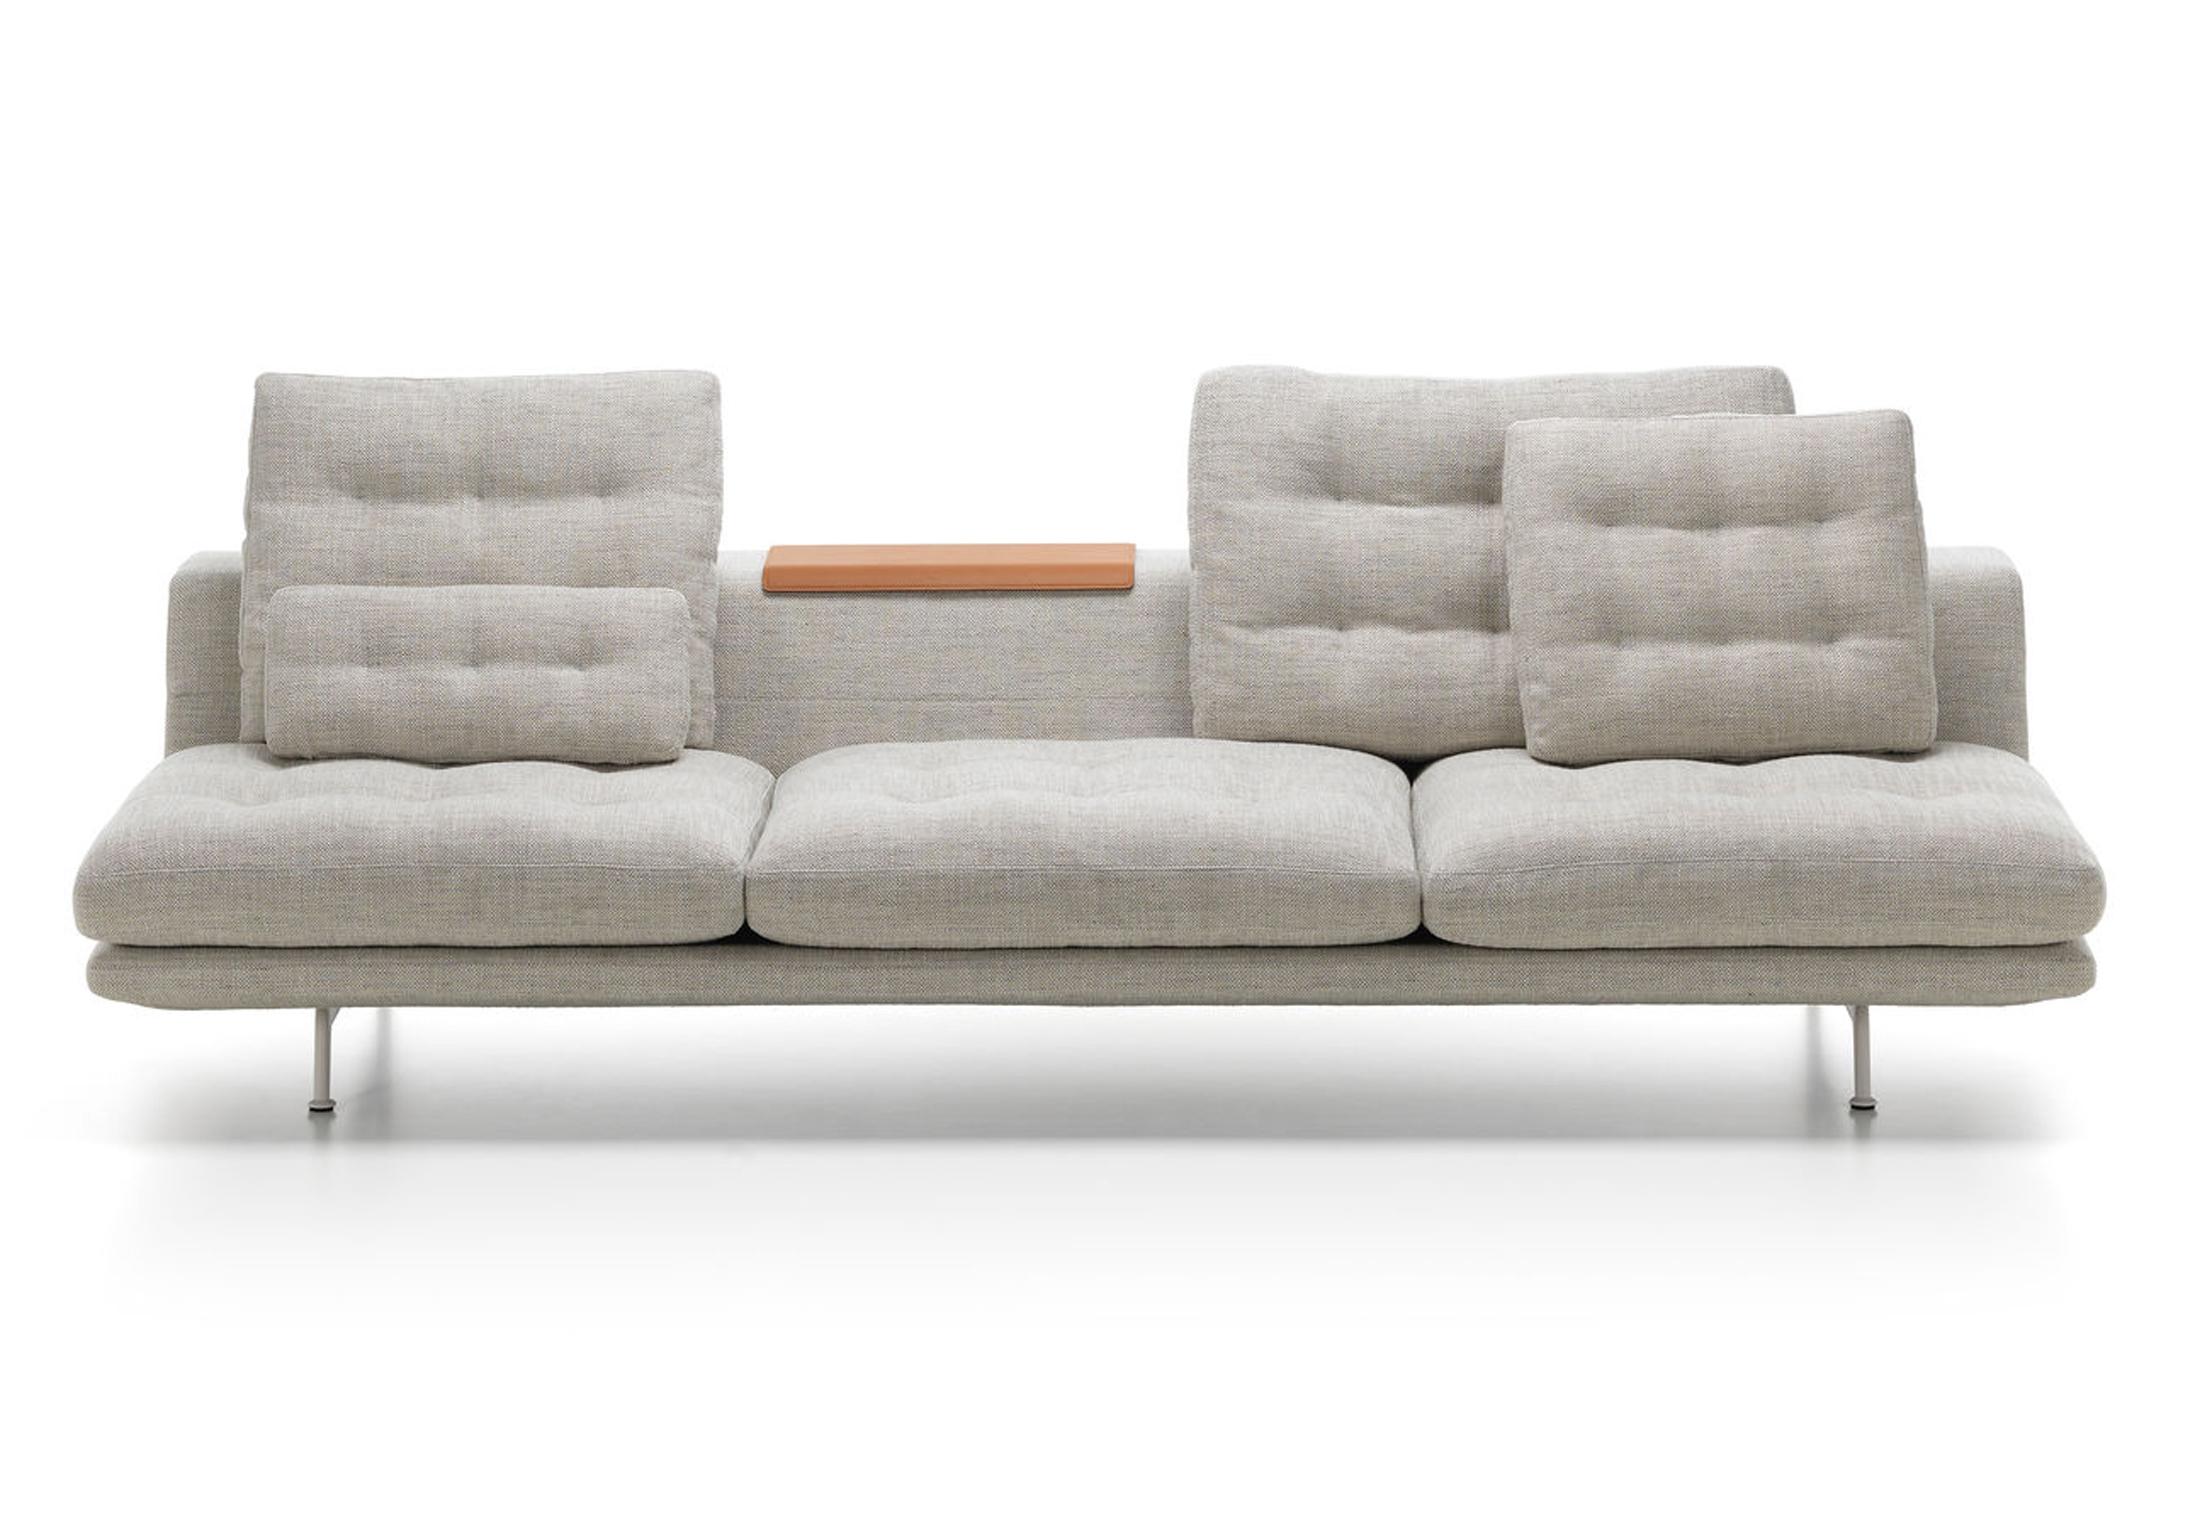 grand sofa sears canada furniture sofà by vitra stylepark